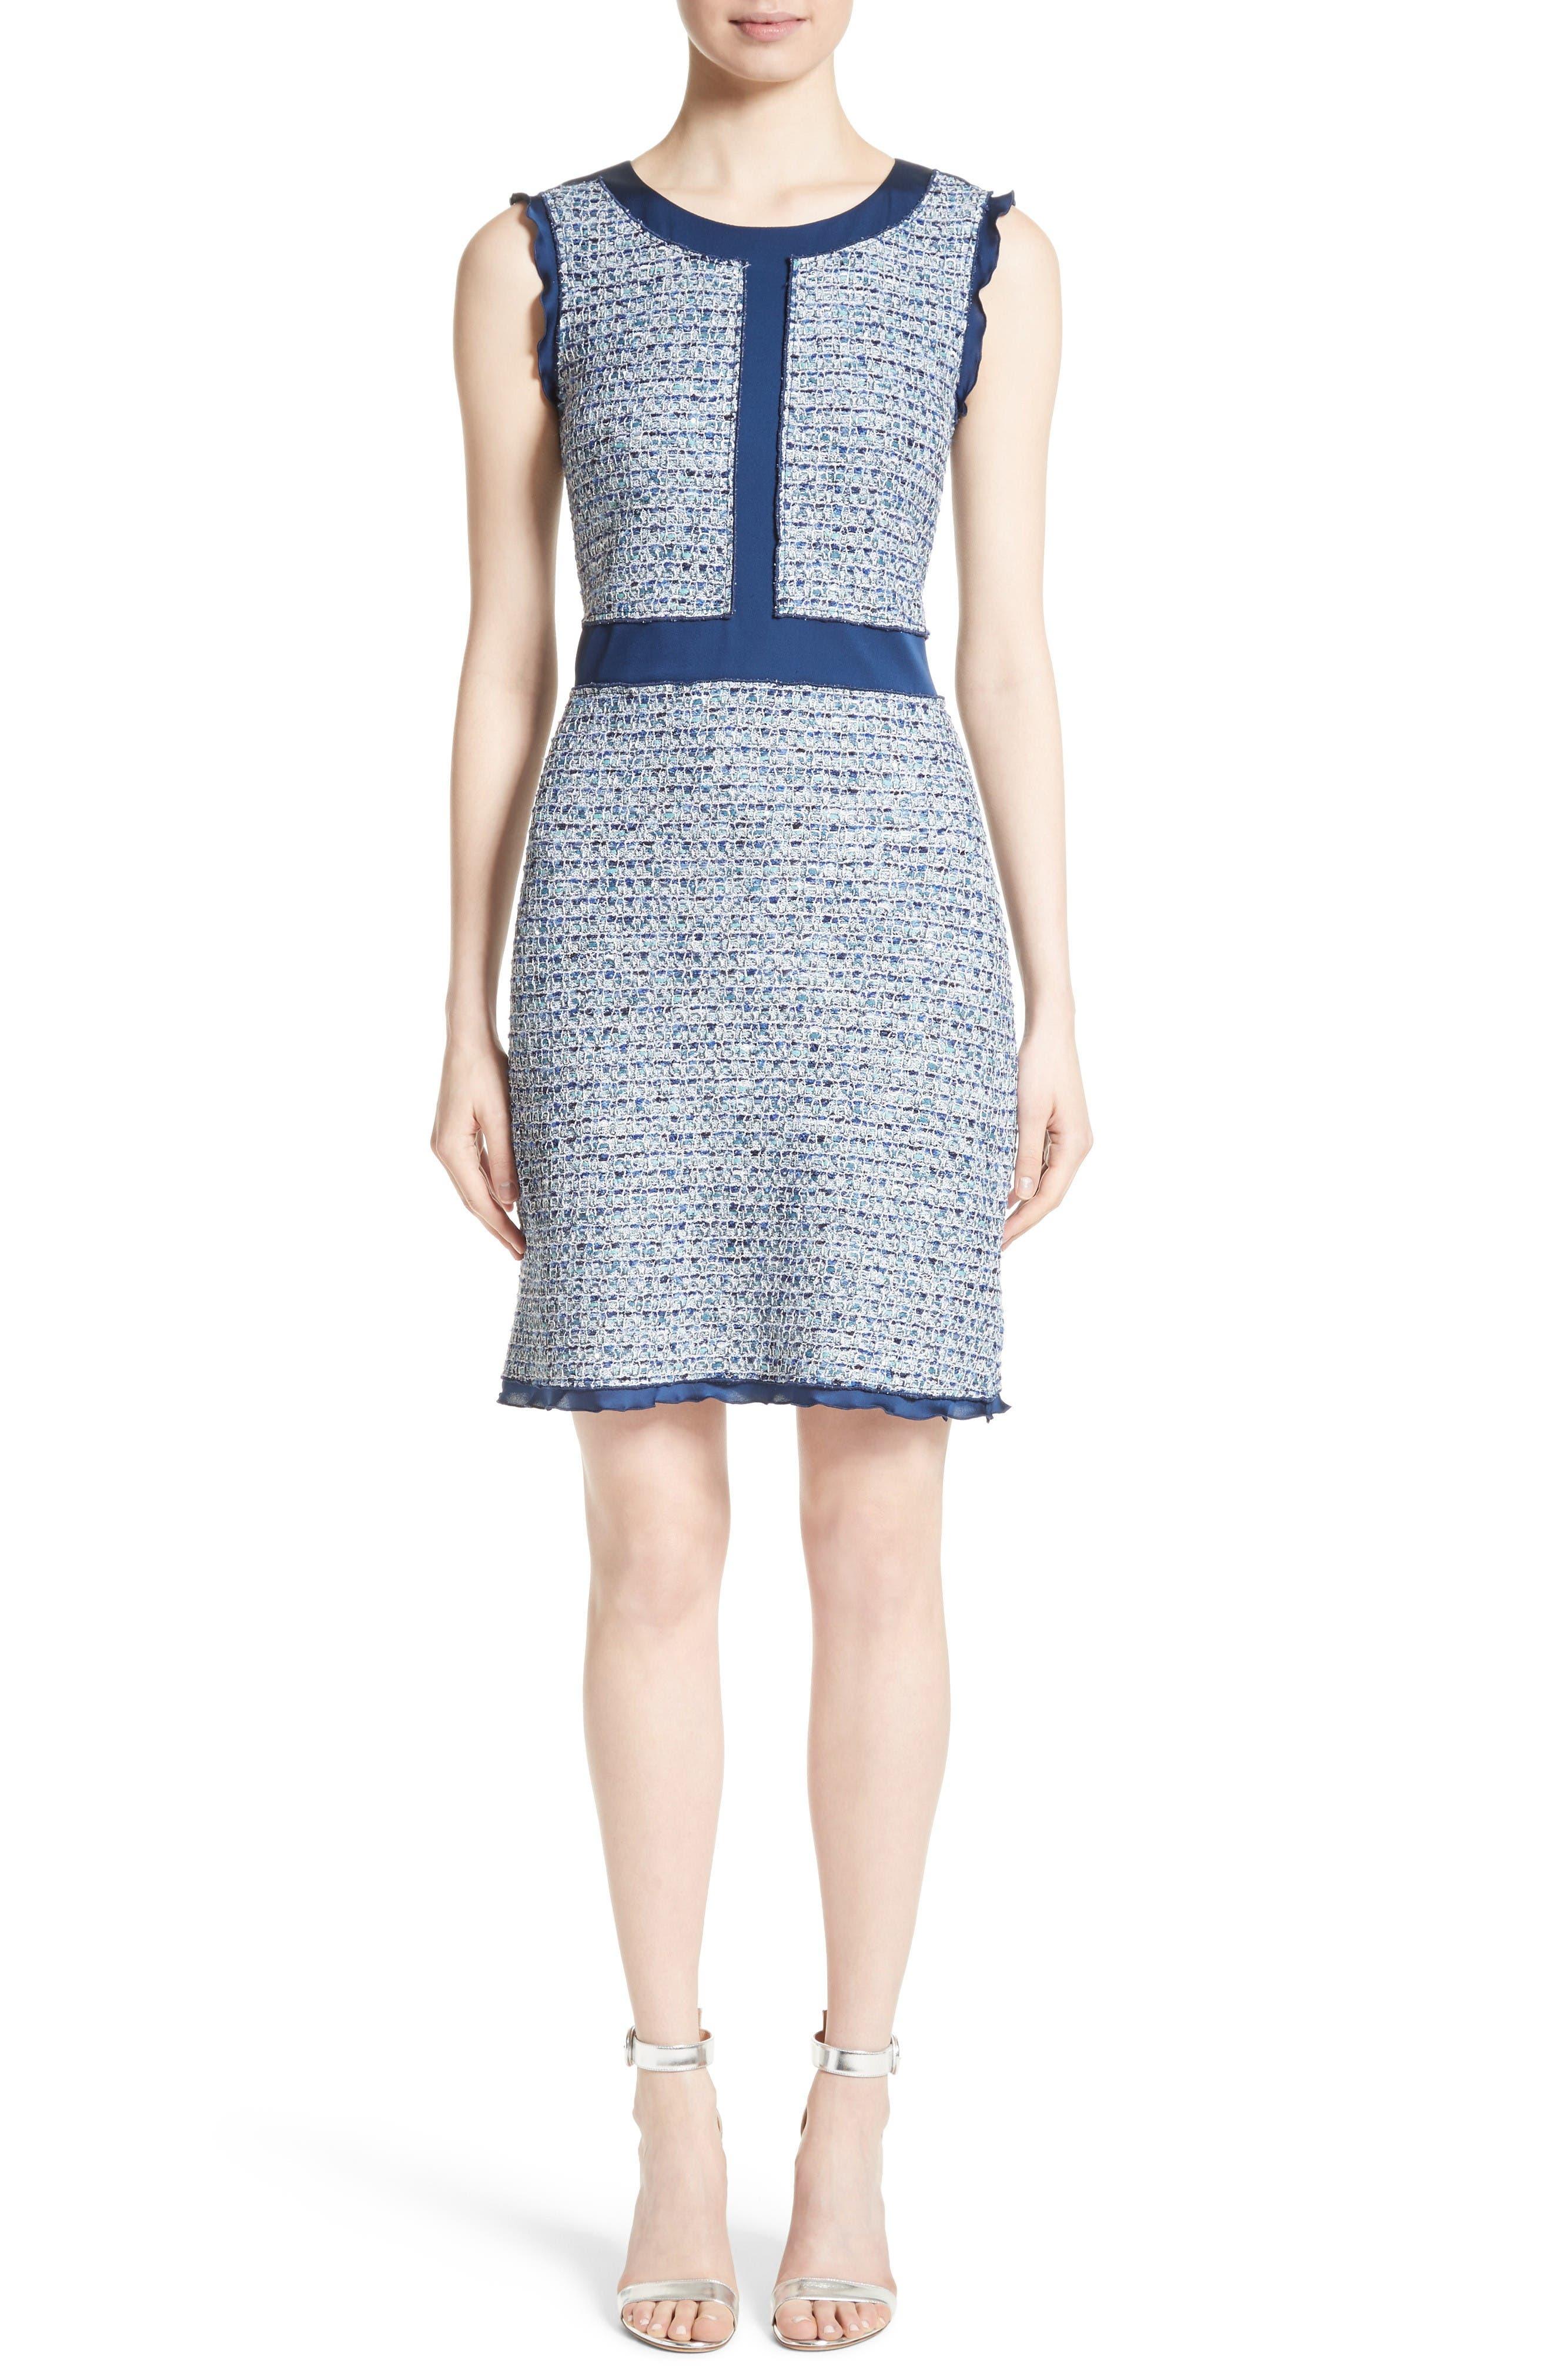 Alternate Image 1 Selected - St. John Collection Kiara Tweed A-Line Dress